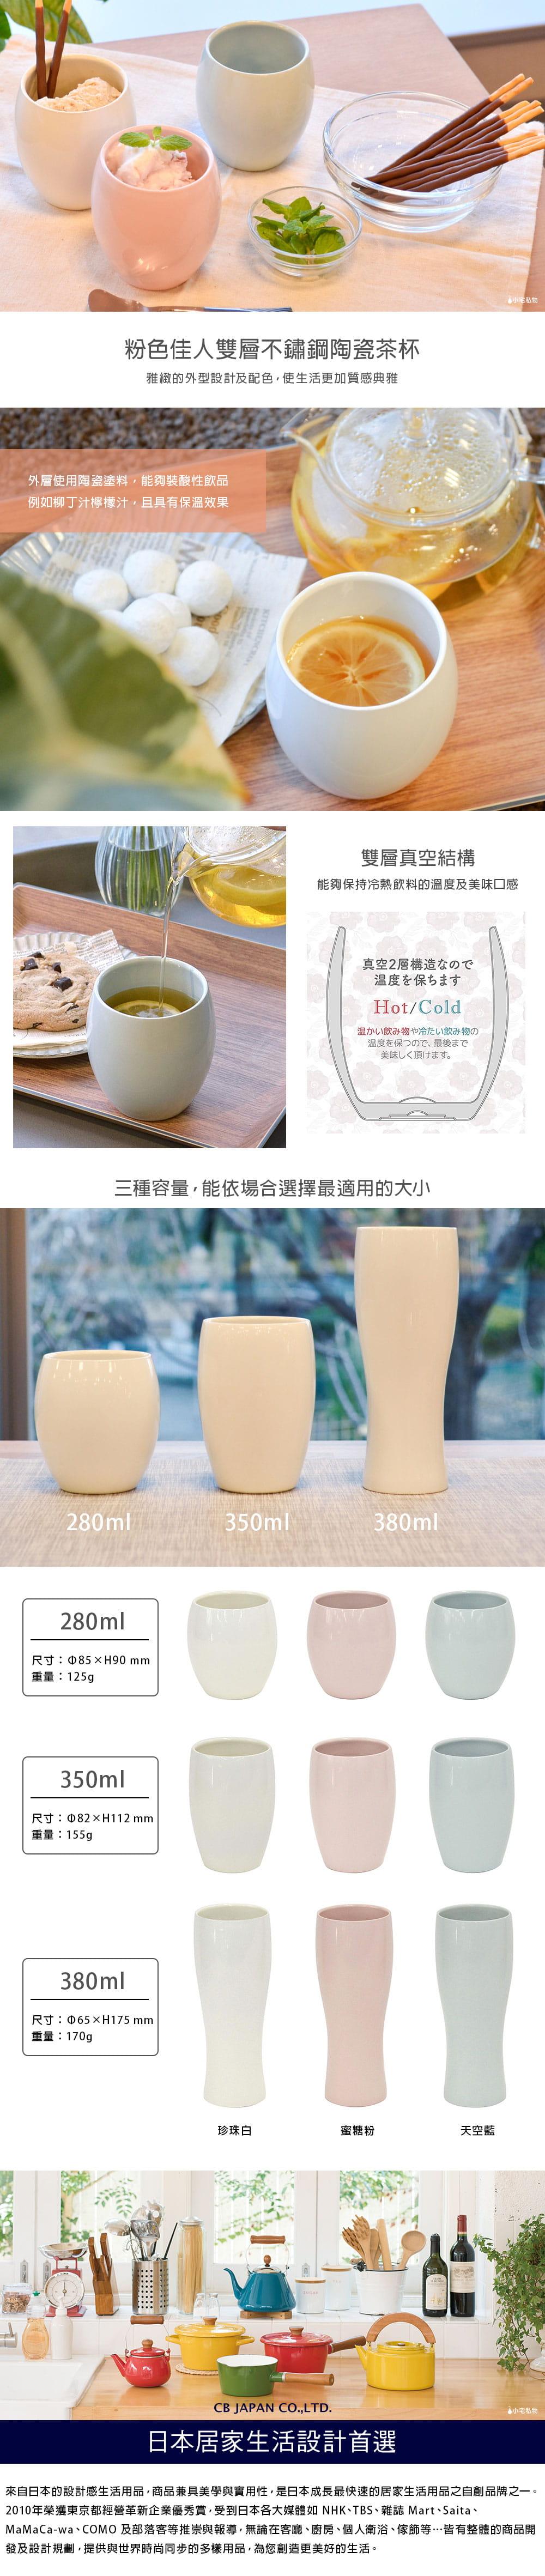 CB Japan 粉色佳人雙層不鏽鋼陶瓷啤酒杯380ml